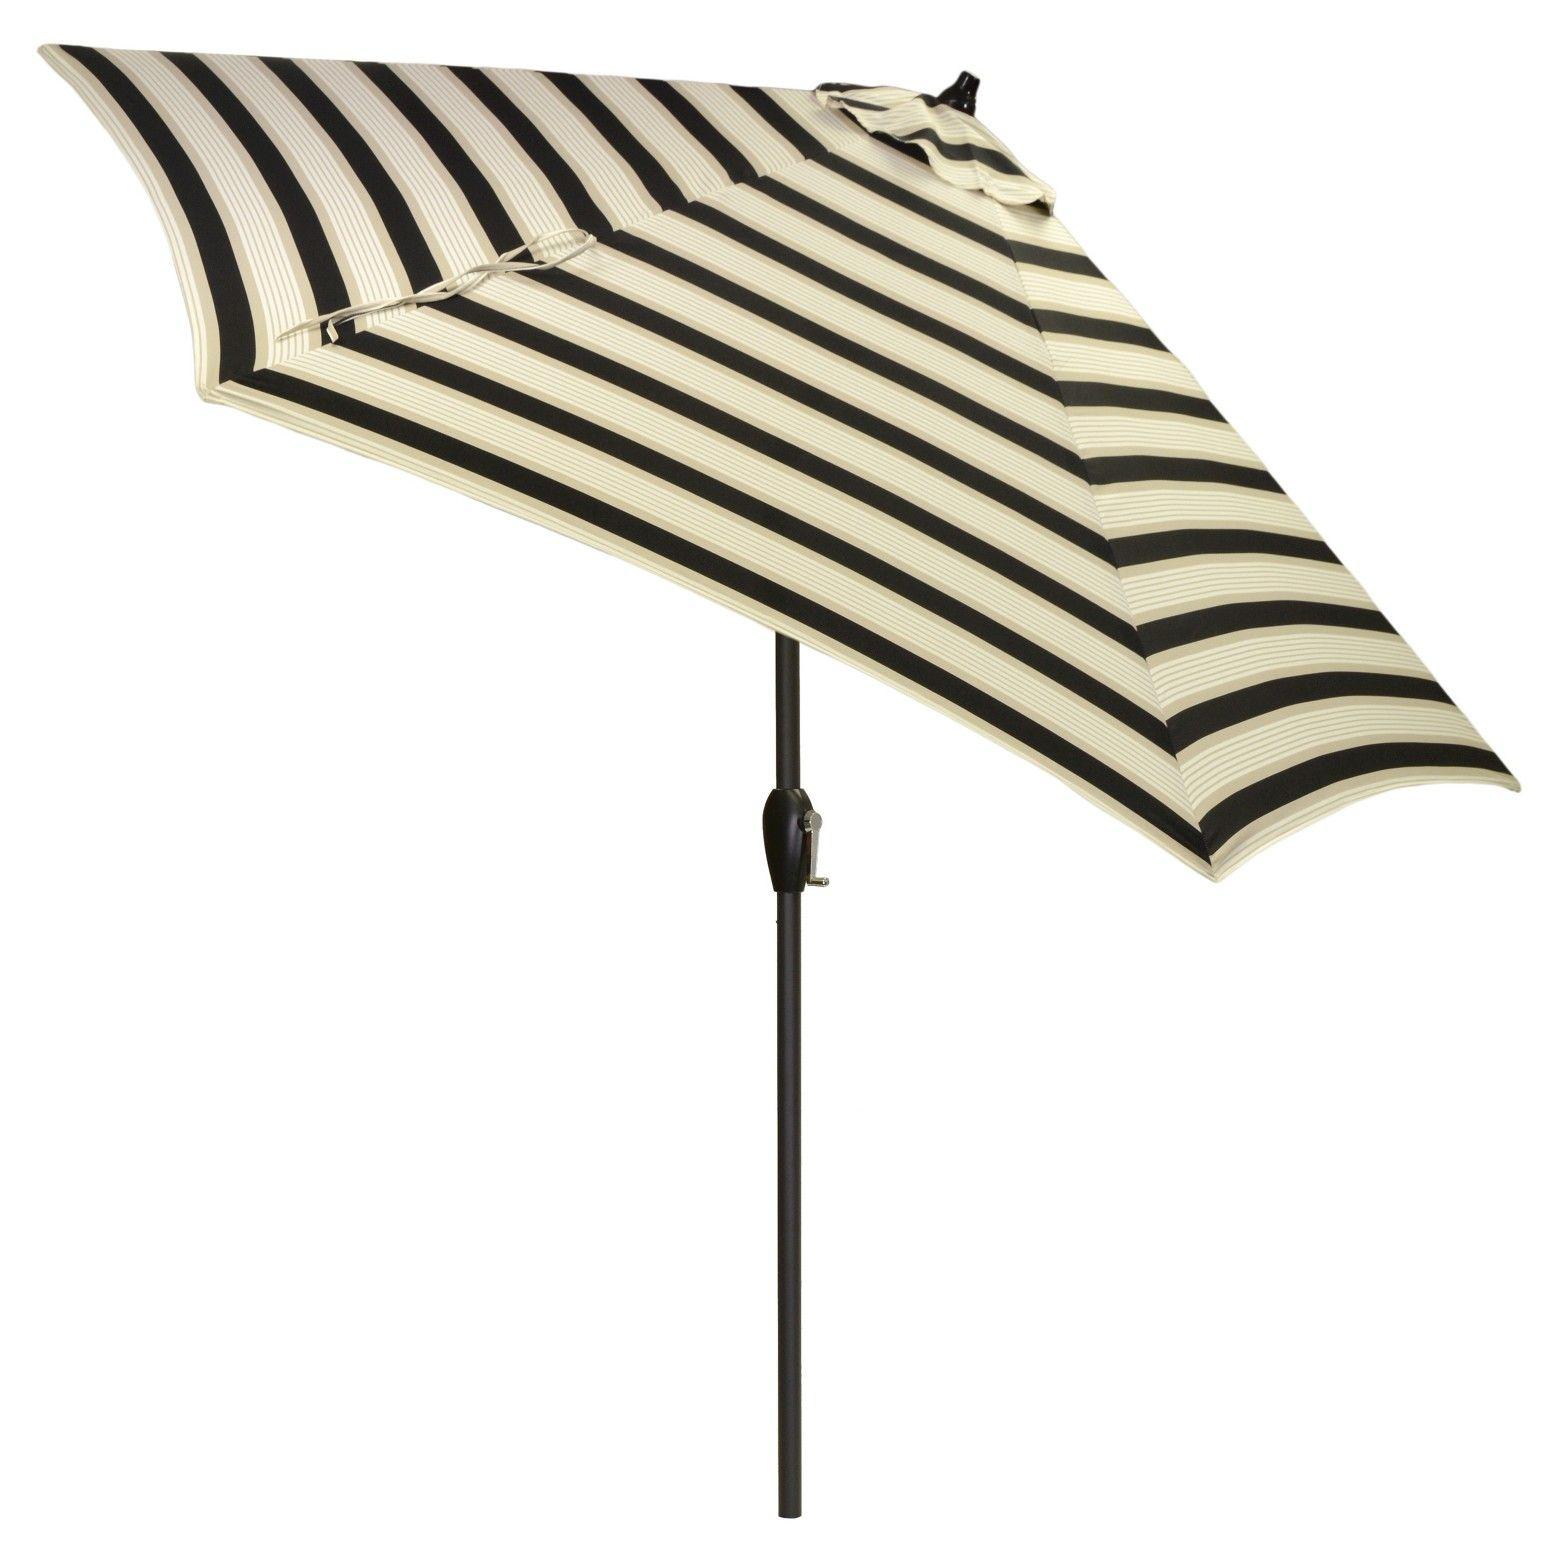 Tar patio umbrella in black and beige stripes